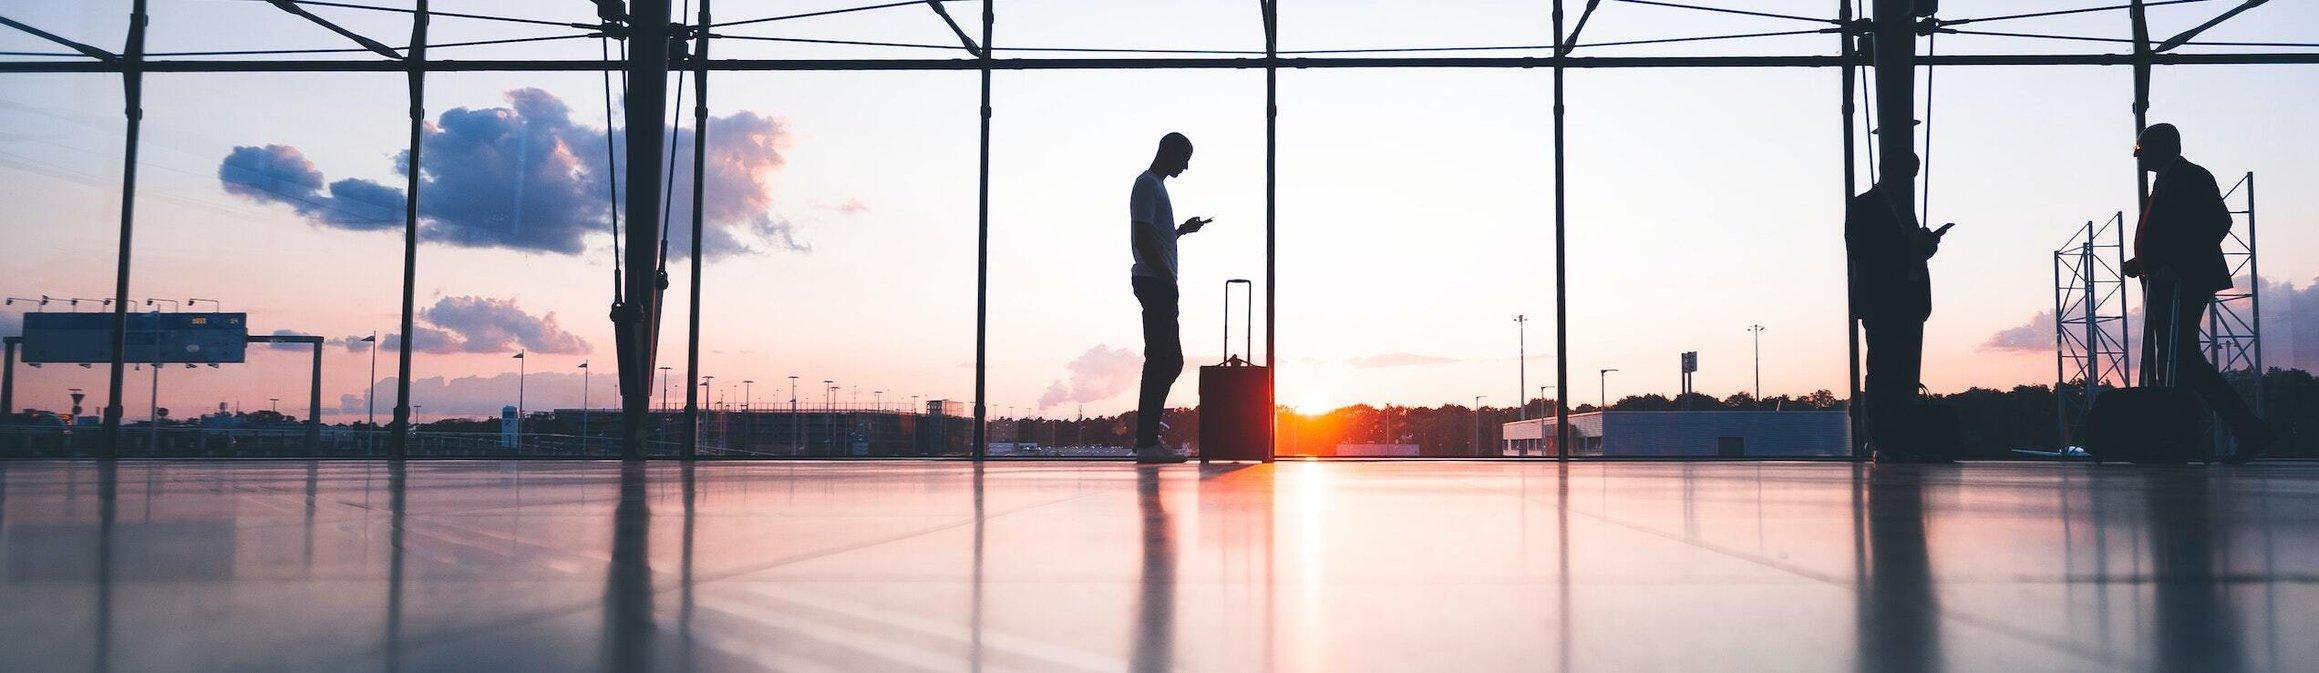 airport-waiting